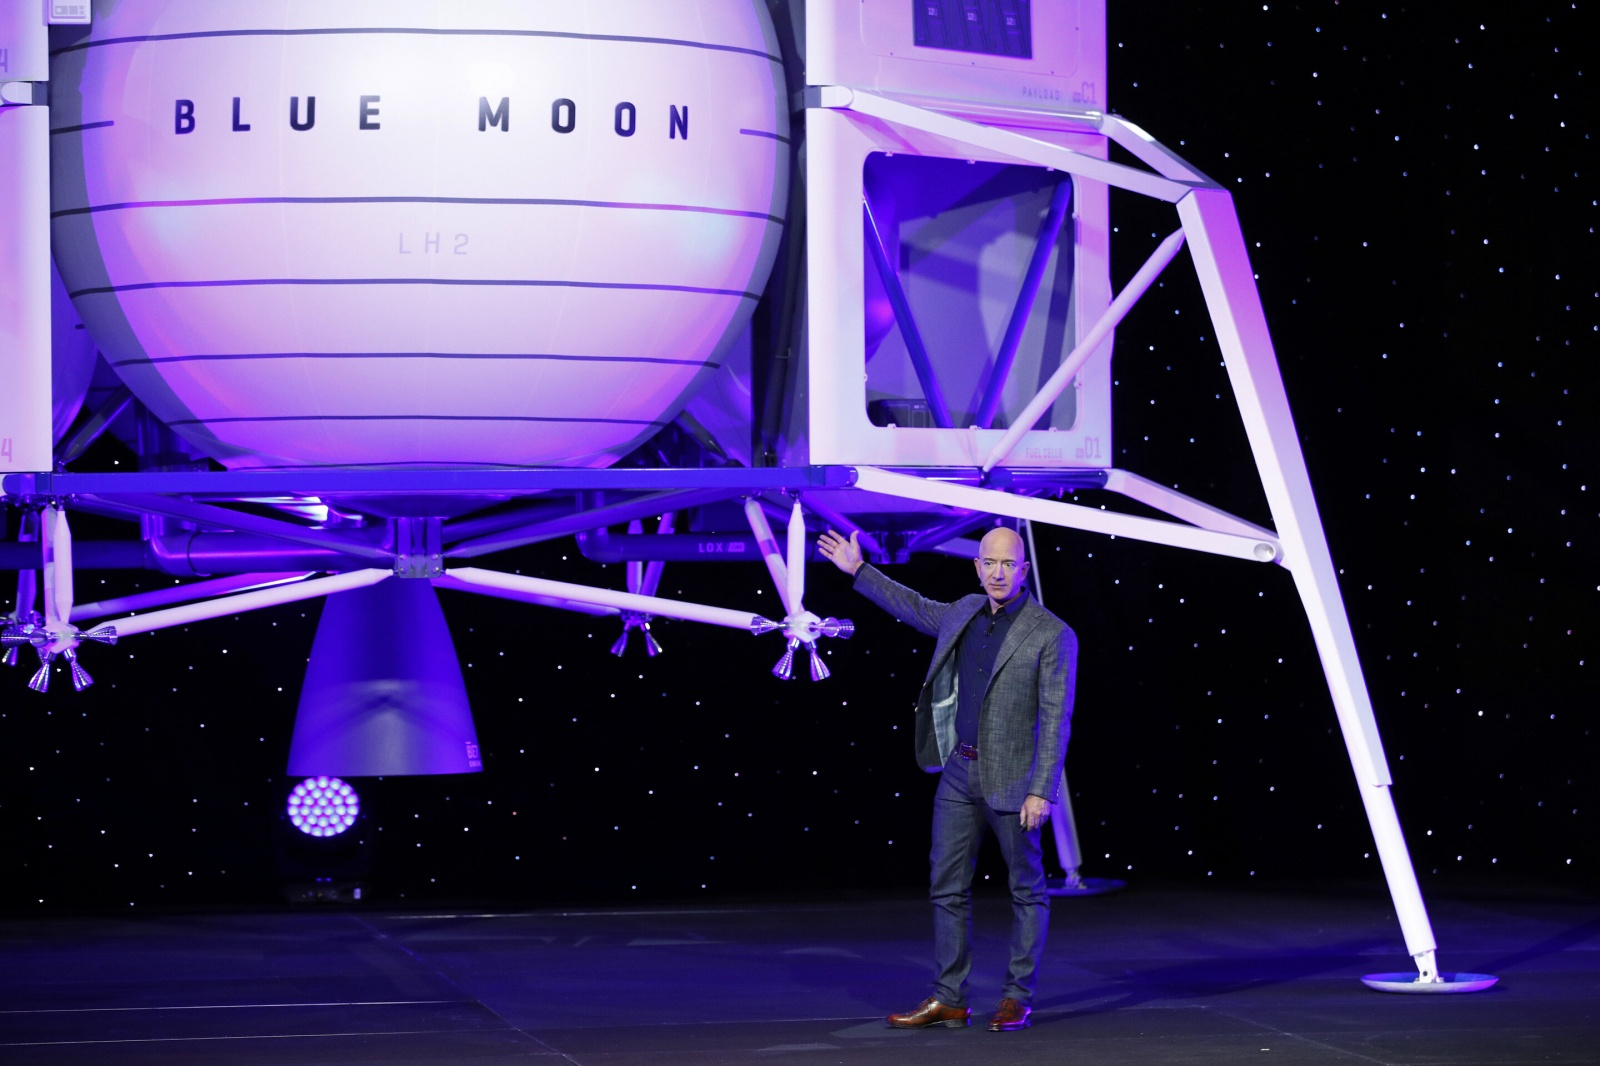 Проект «Blue Moon» от Blue Origin: люди на Луне к 2024 году - 1